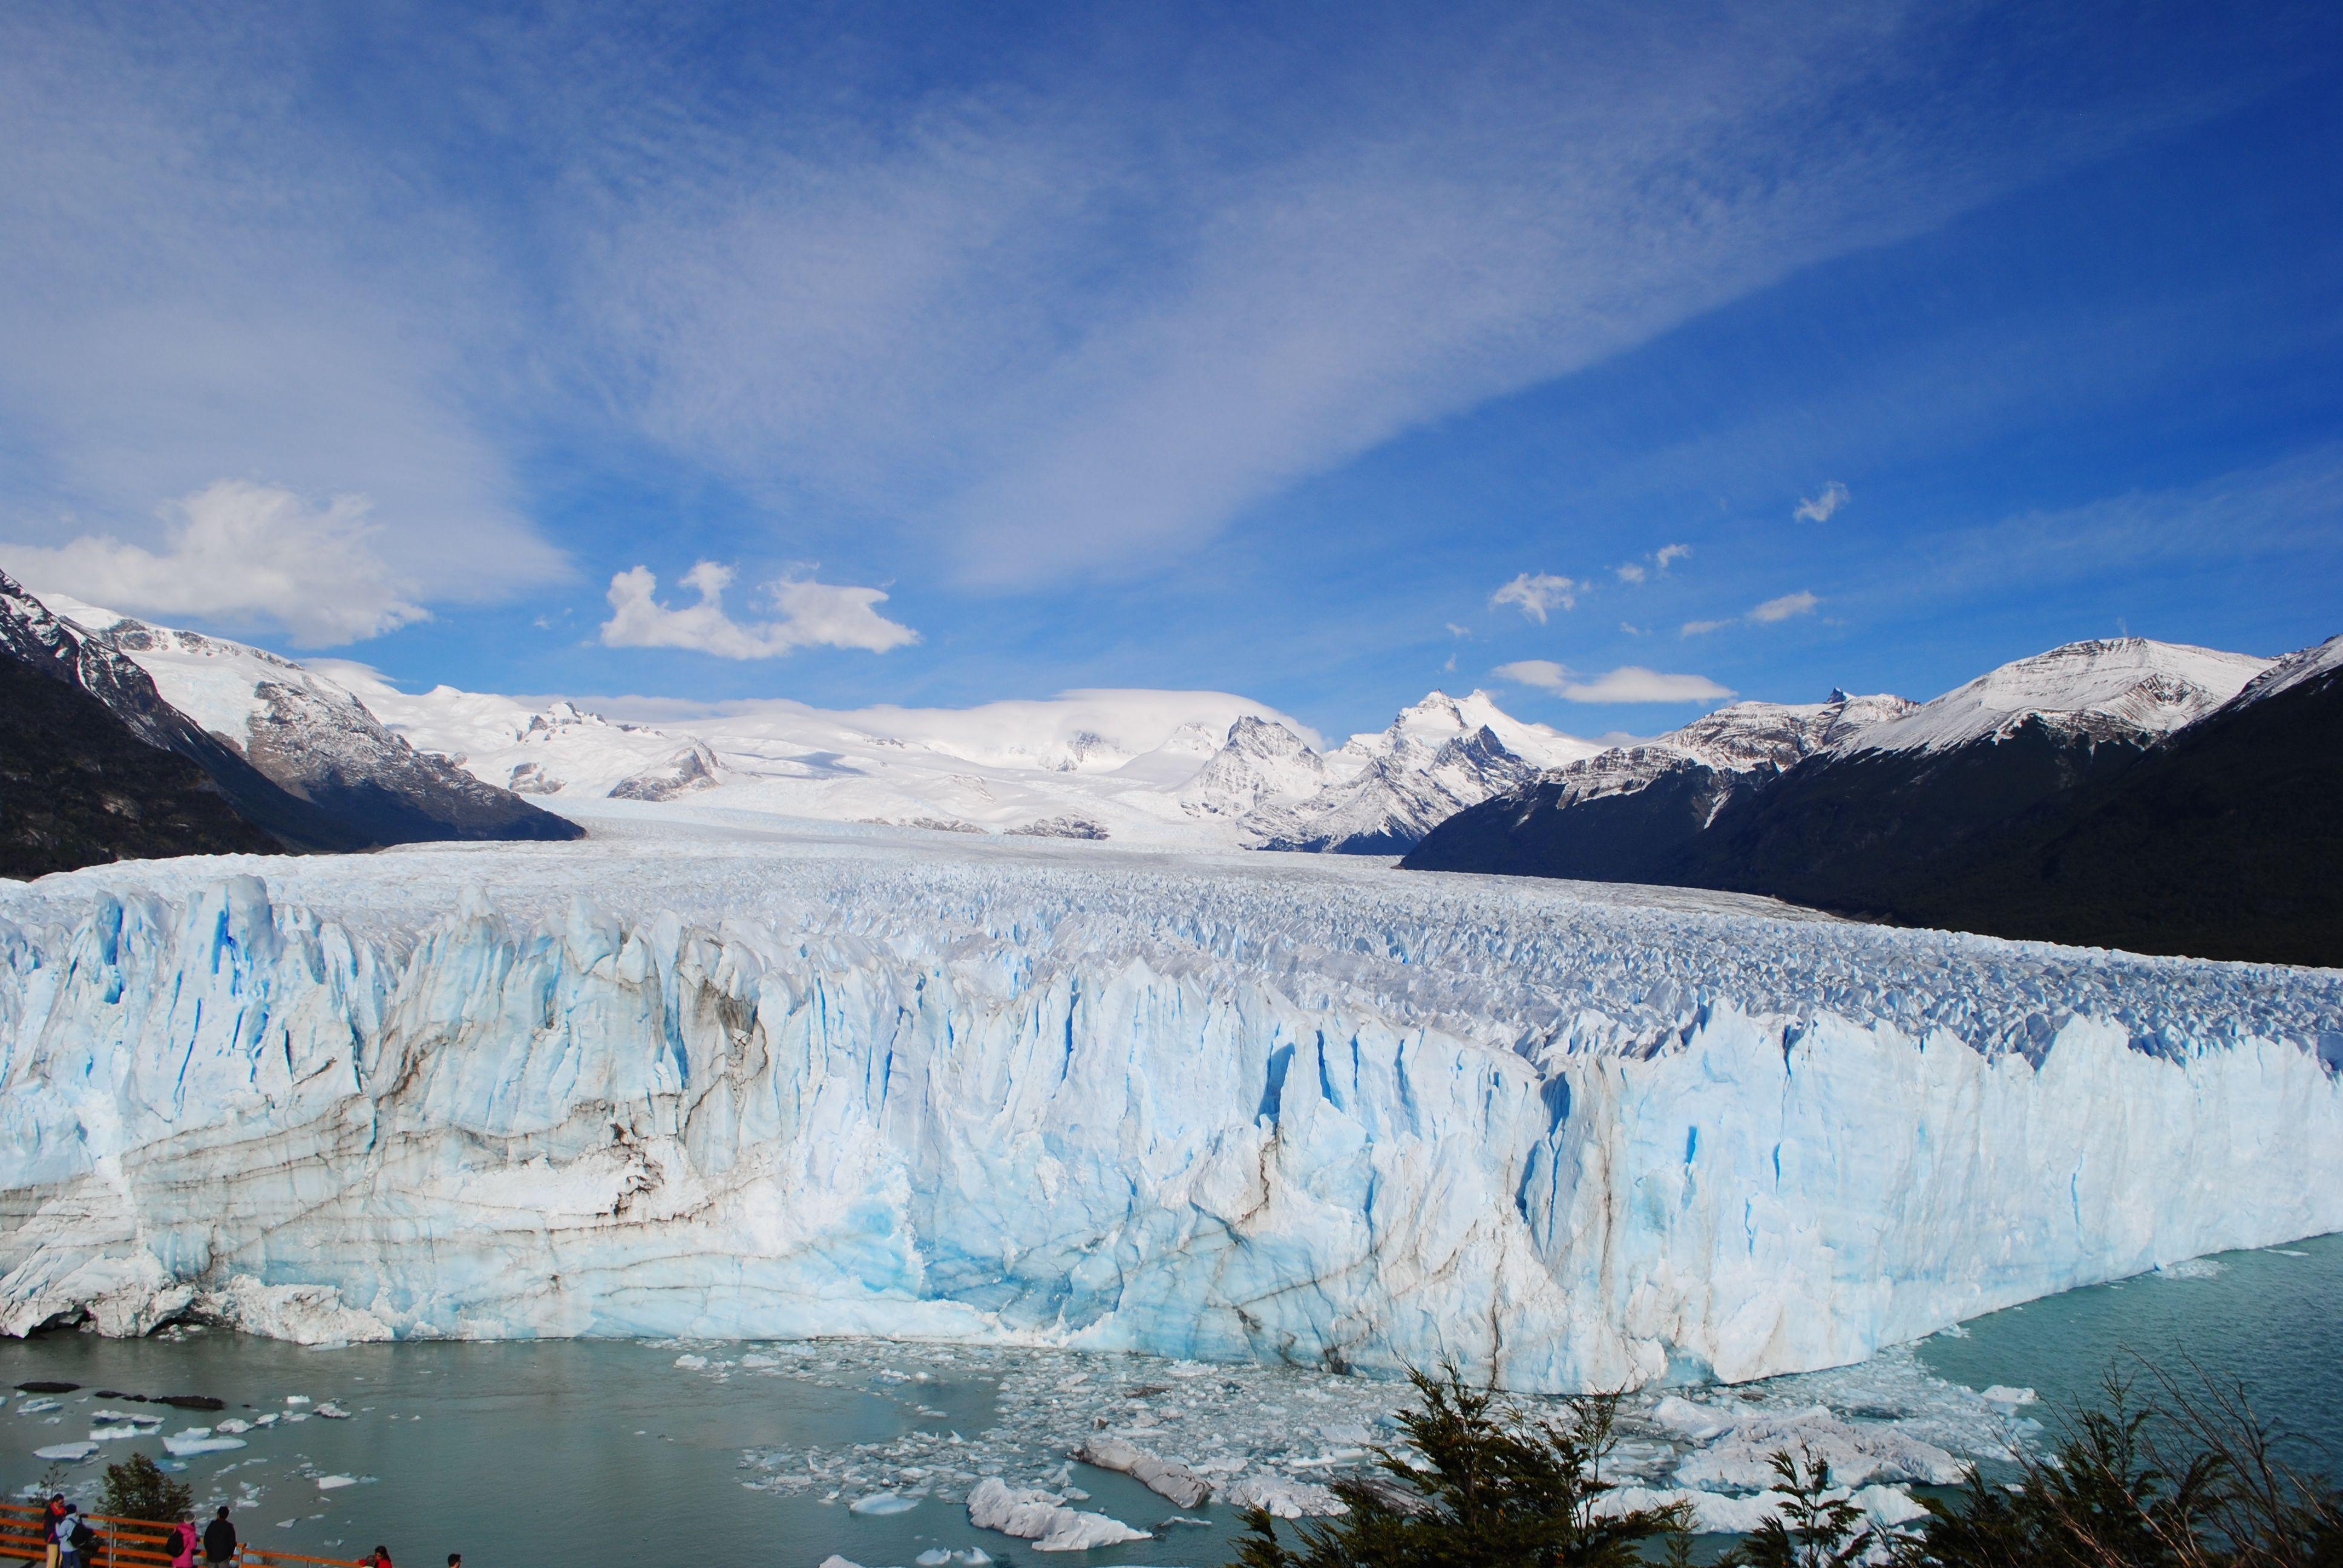 Glaciar Perito Moreno, El Calafate, Argentina